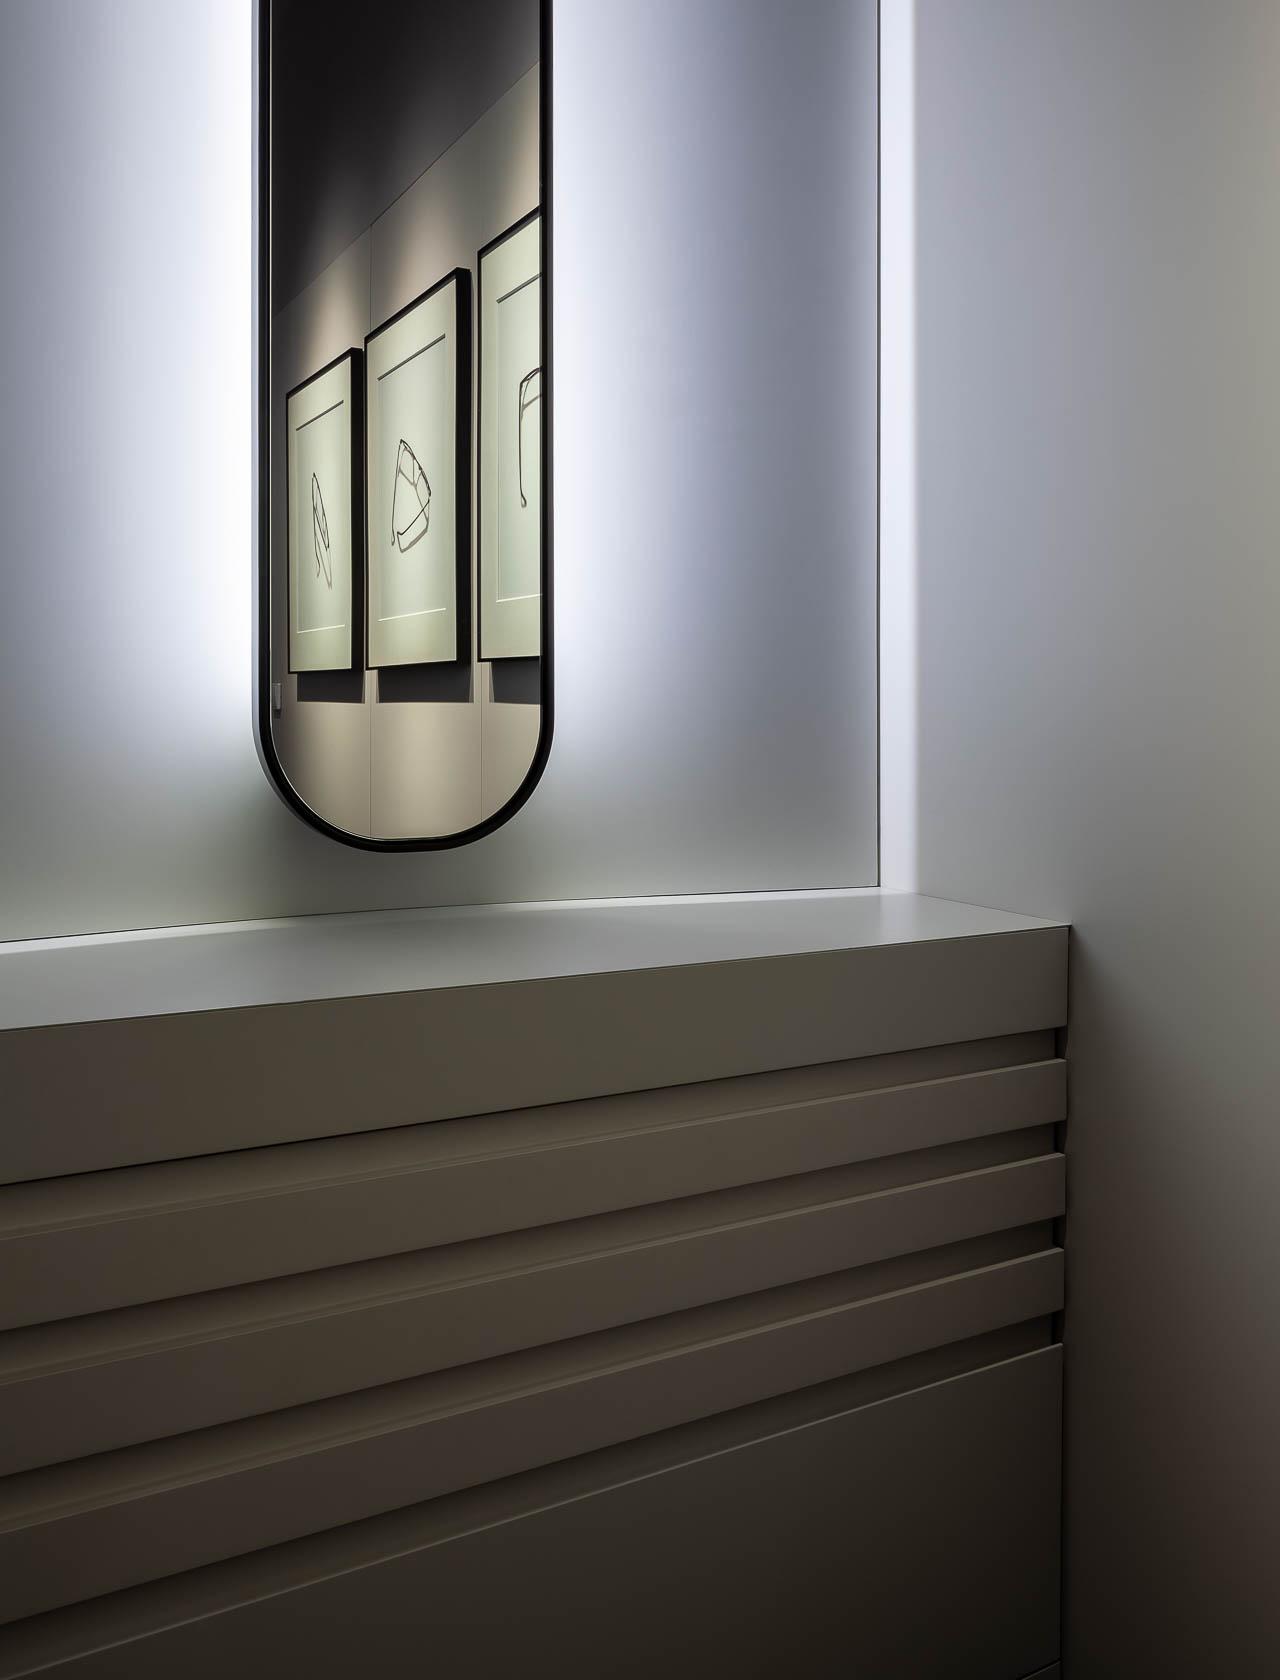 Óptica Cervantes - Sevilla     Giordano Baly Arquitecto - Manolo Espaliú - Fotografía de Arquitectura